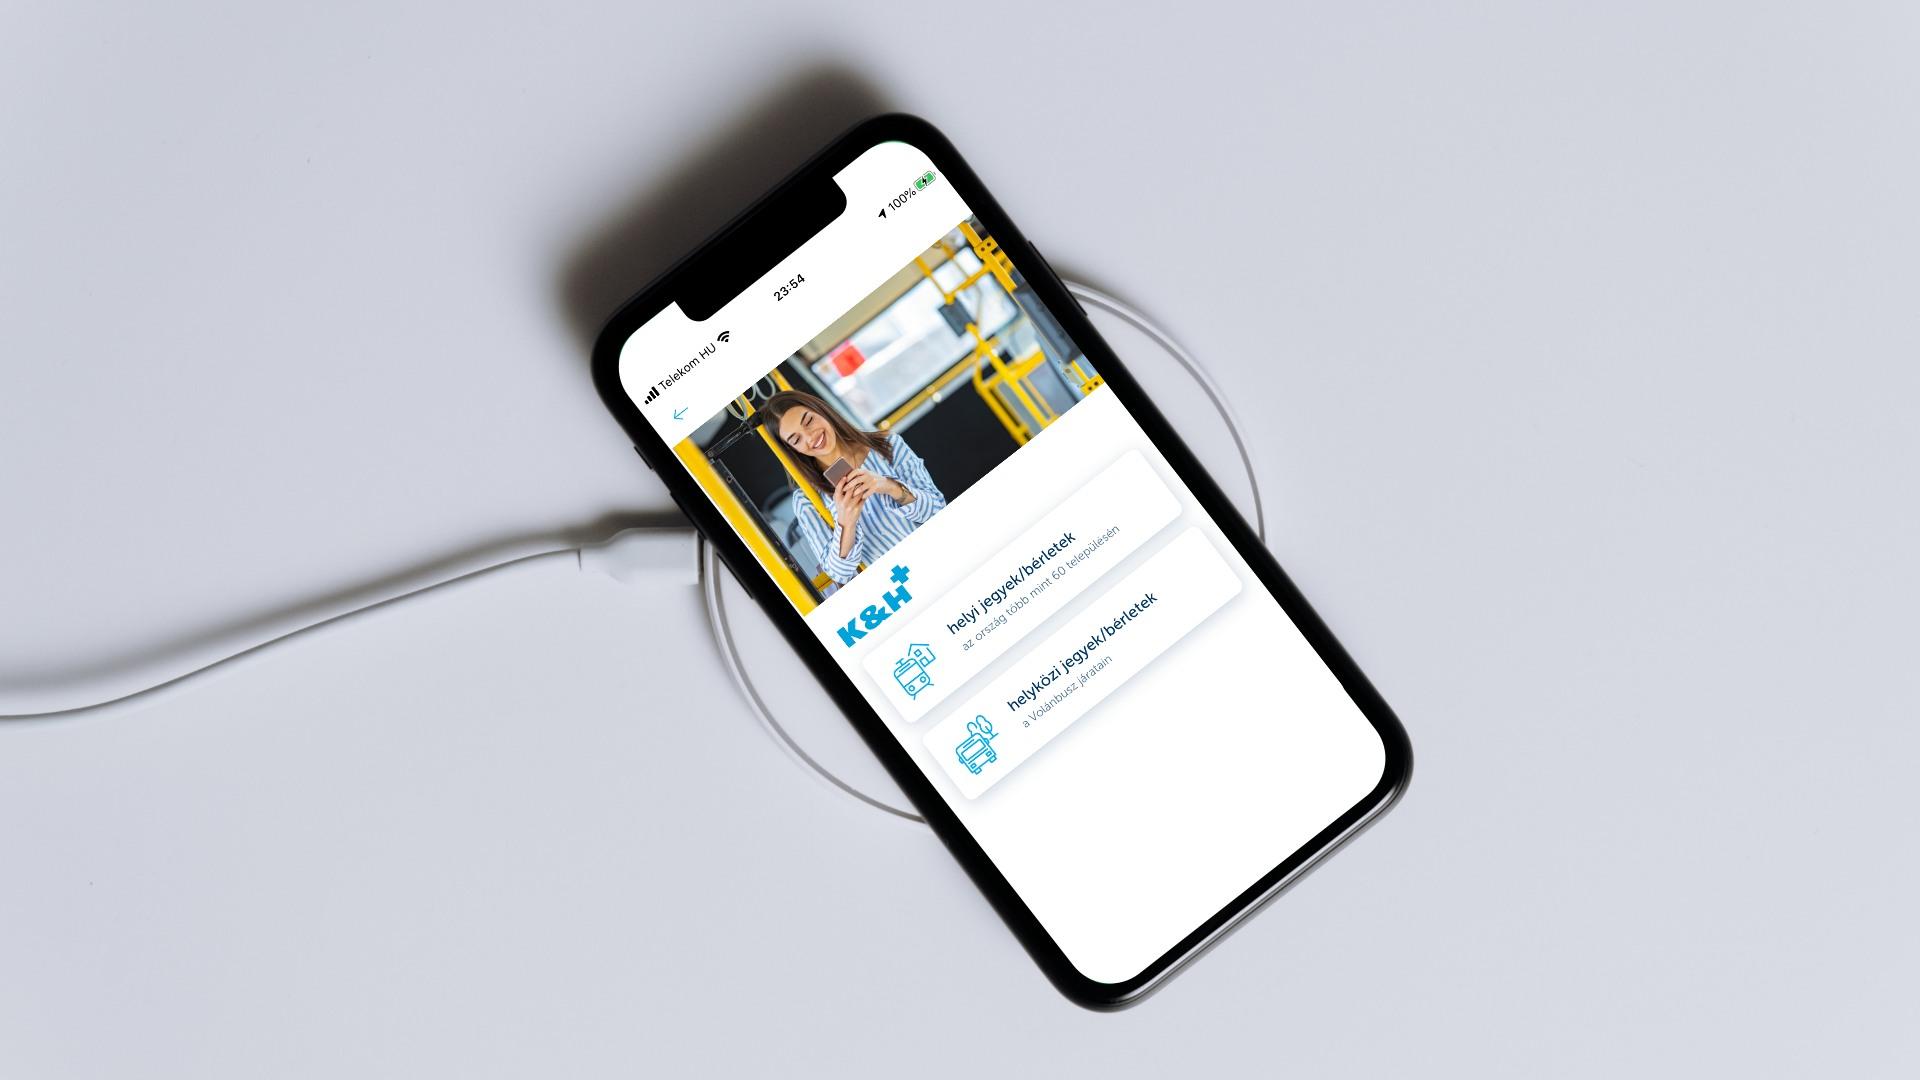 kh+ mobiljegy mobilbank mobiltarca